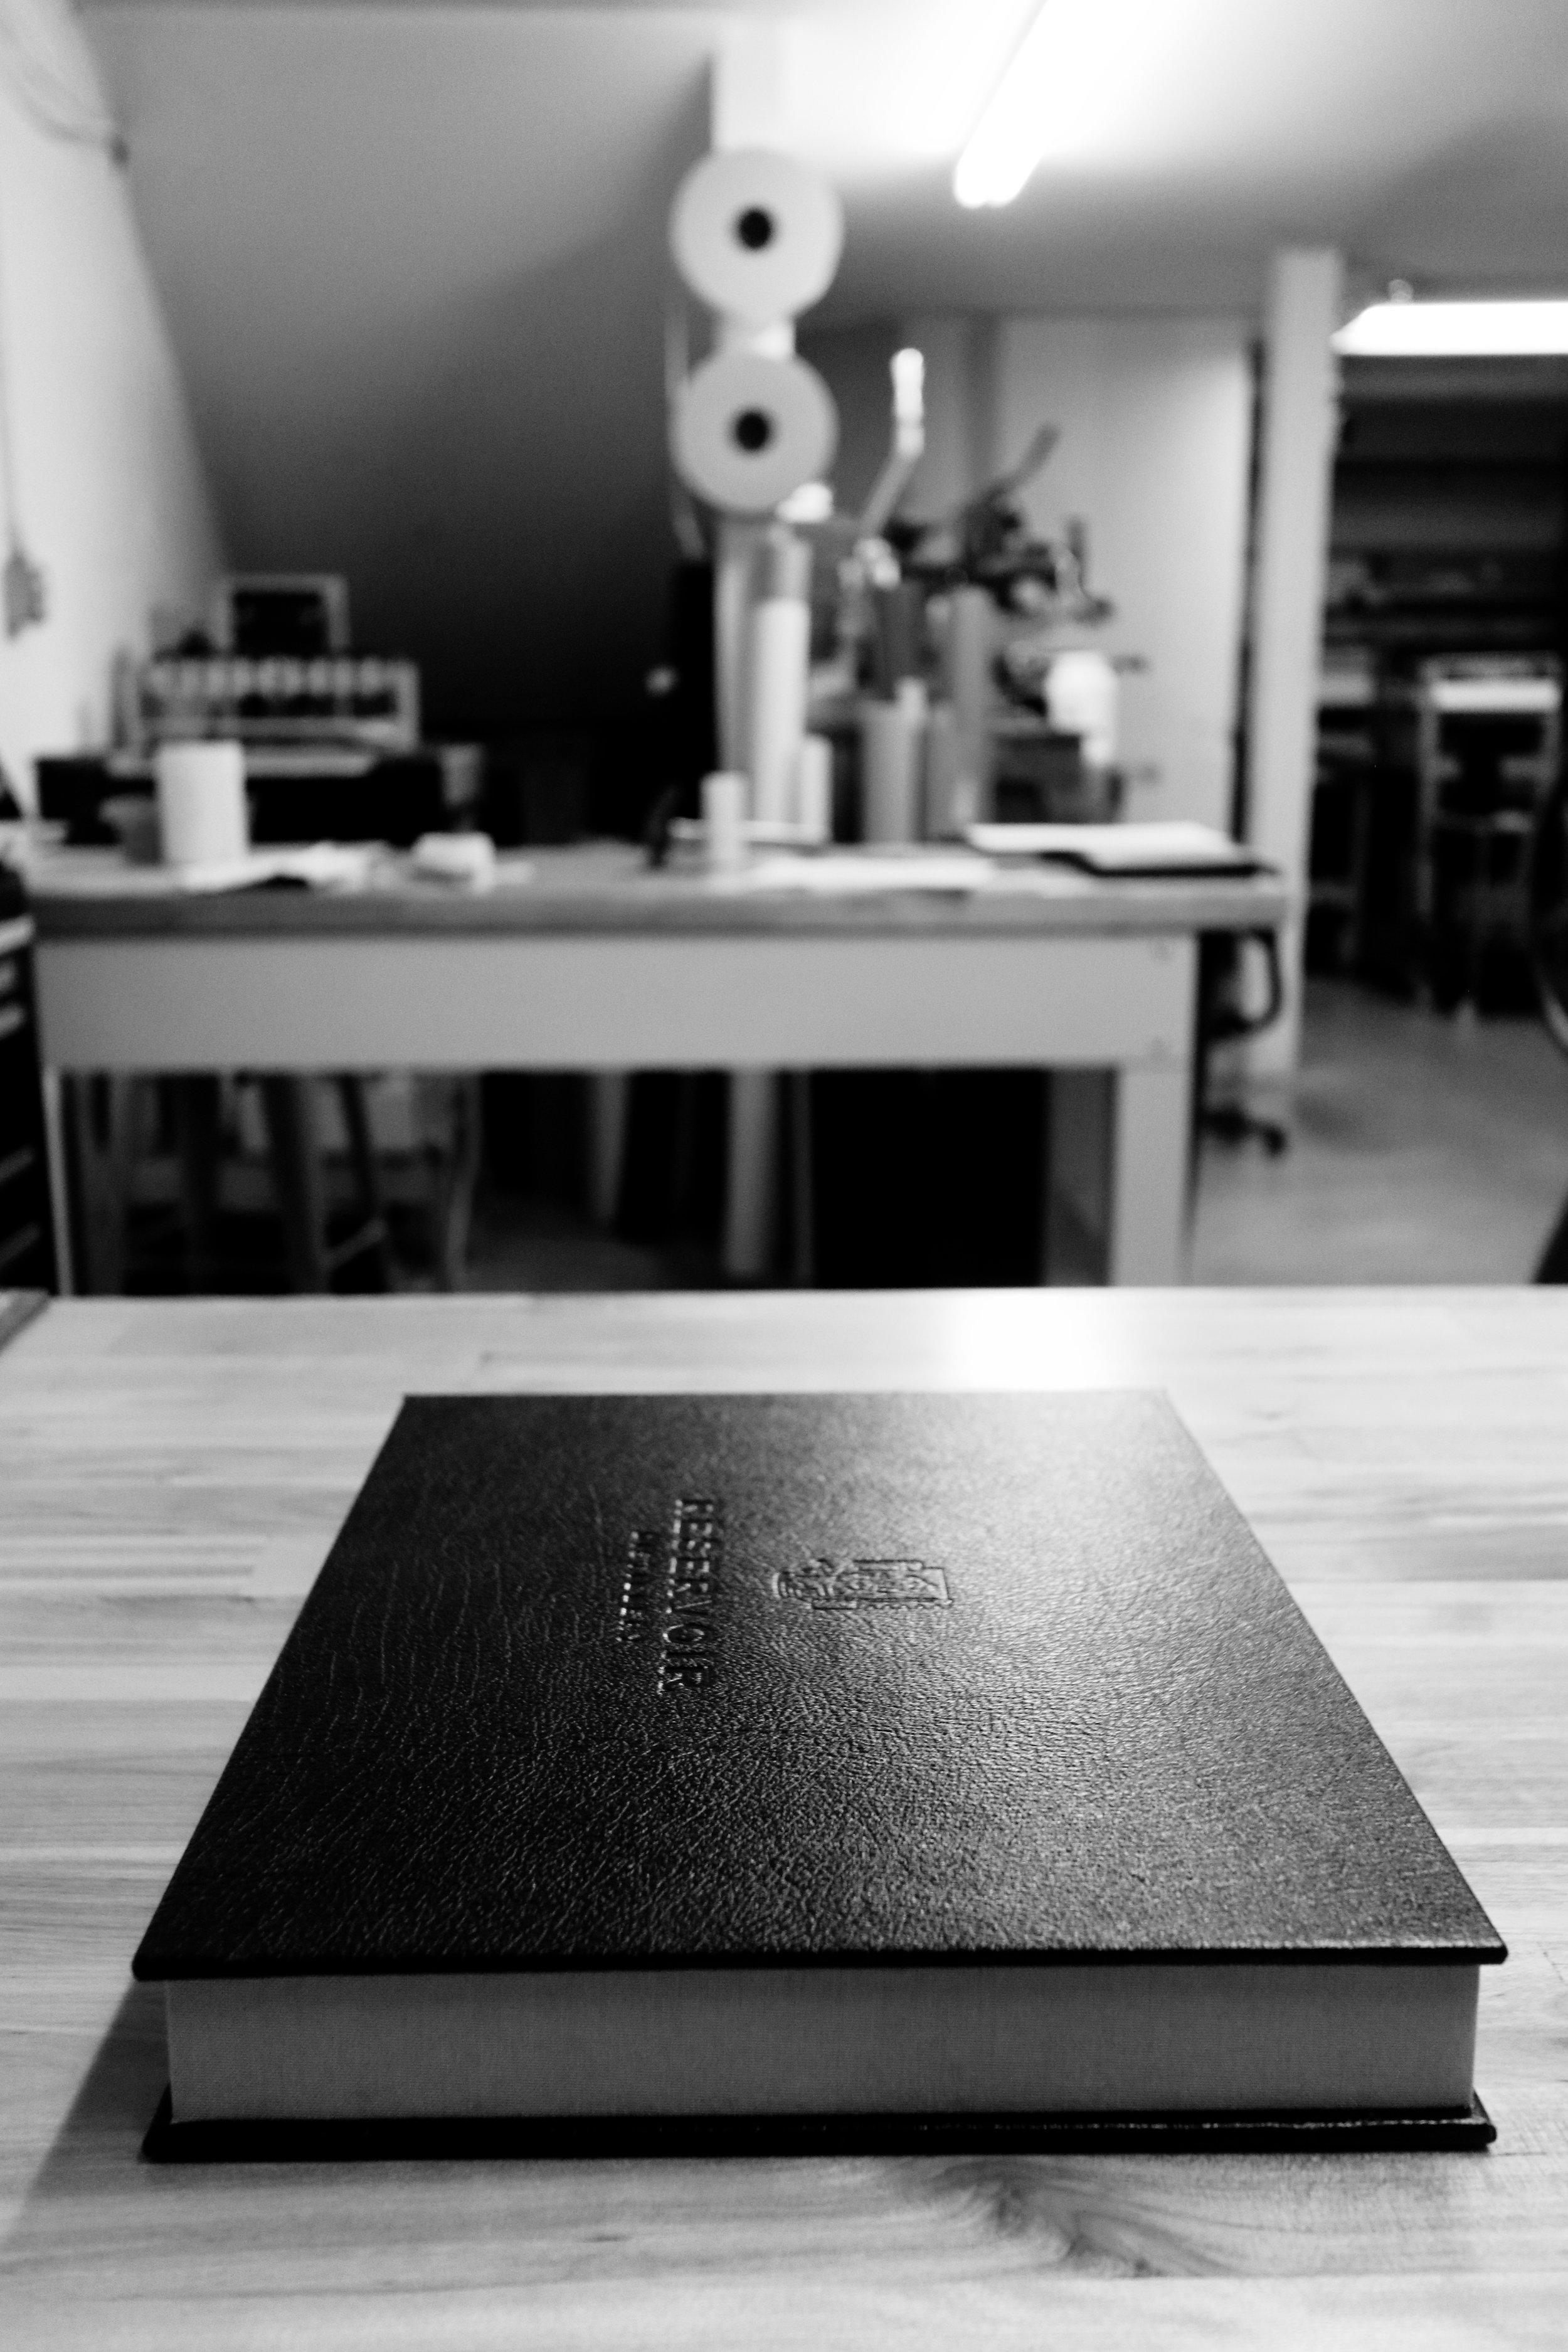 BCRBookbindingbookbox3.JPG